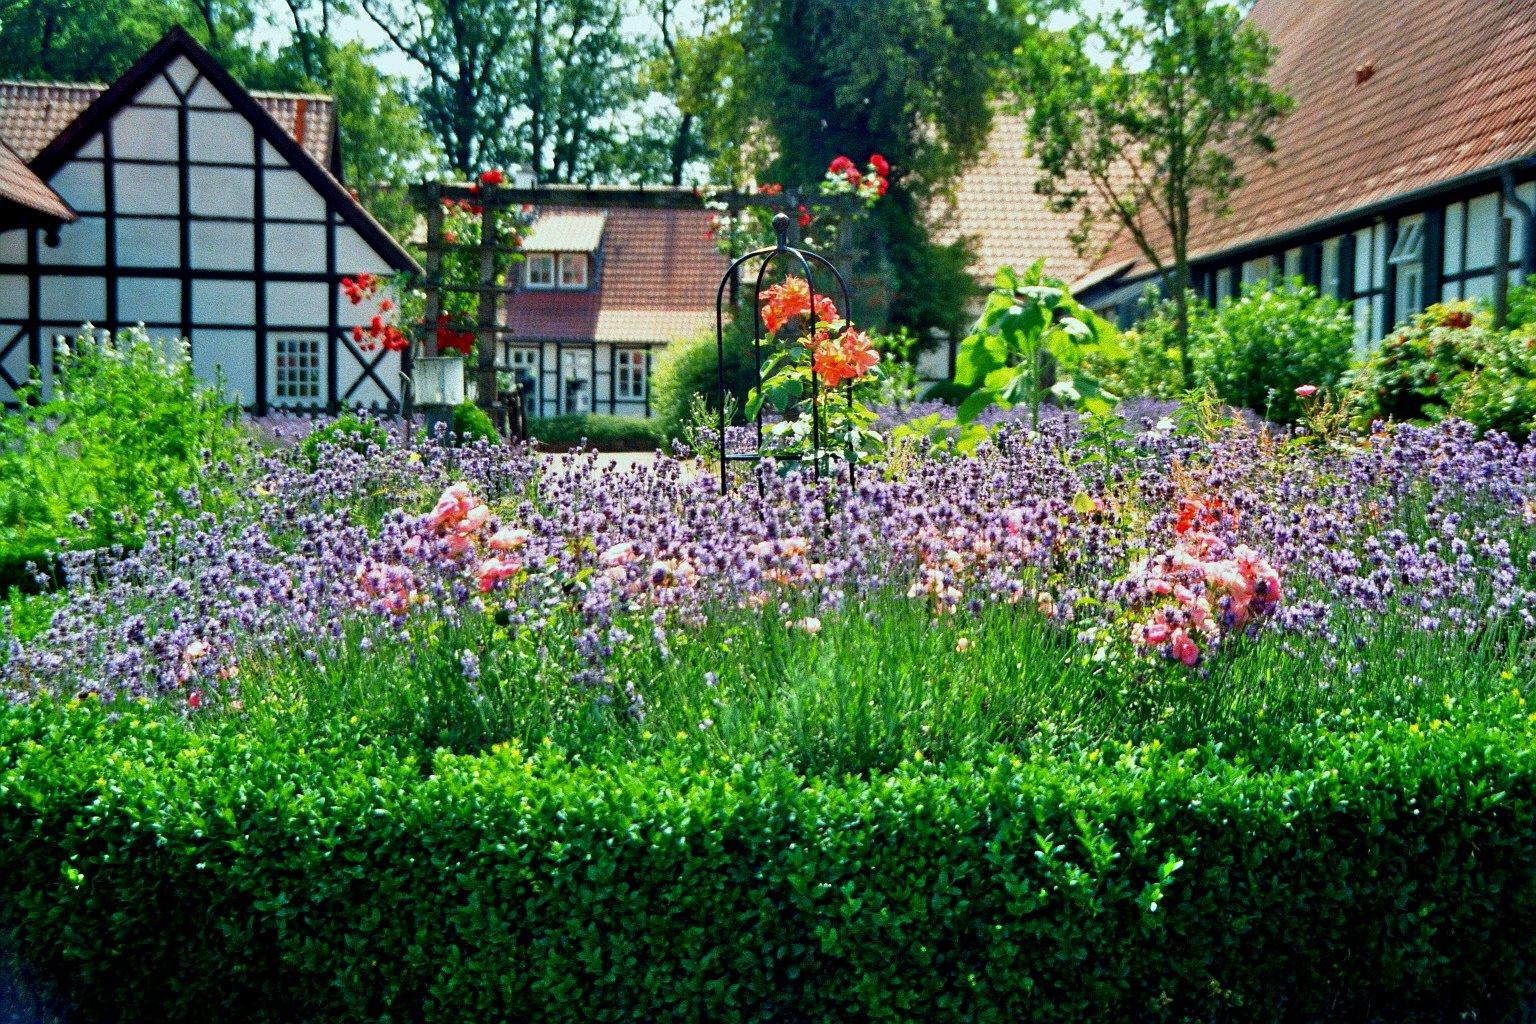 Gardening 101: Six Helpful Tips For Beginner Gardeners